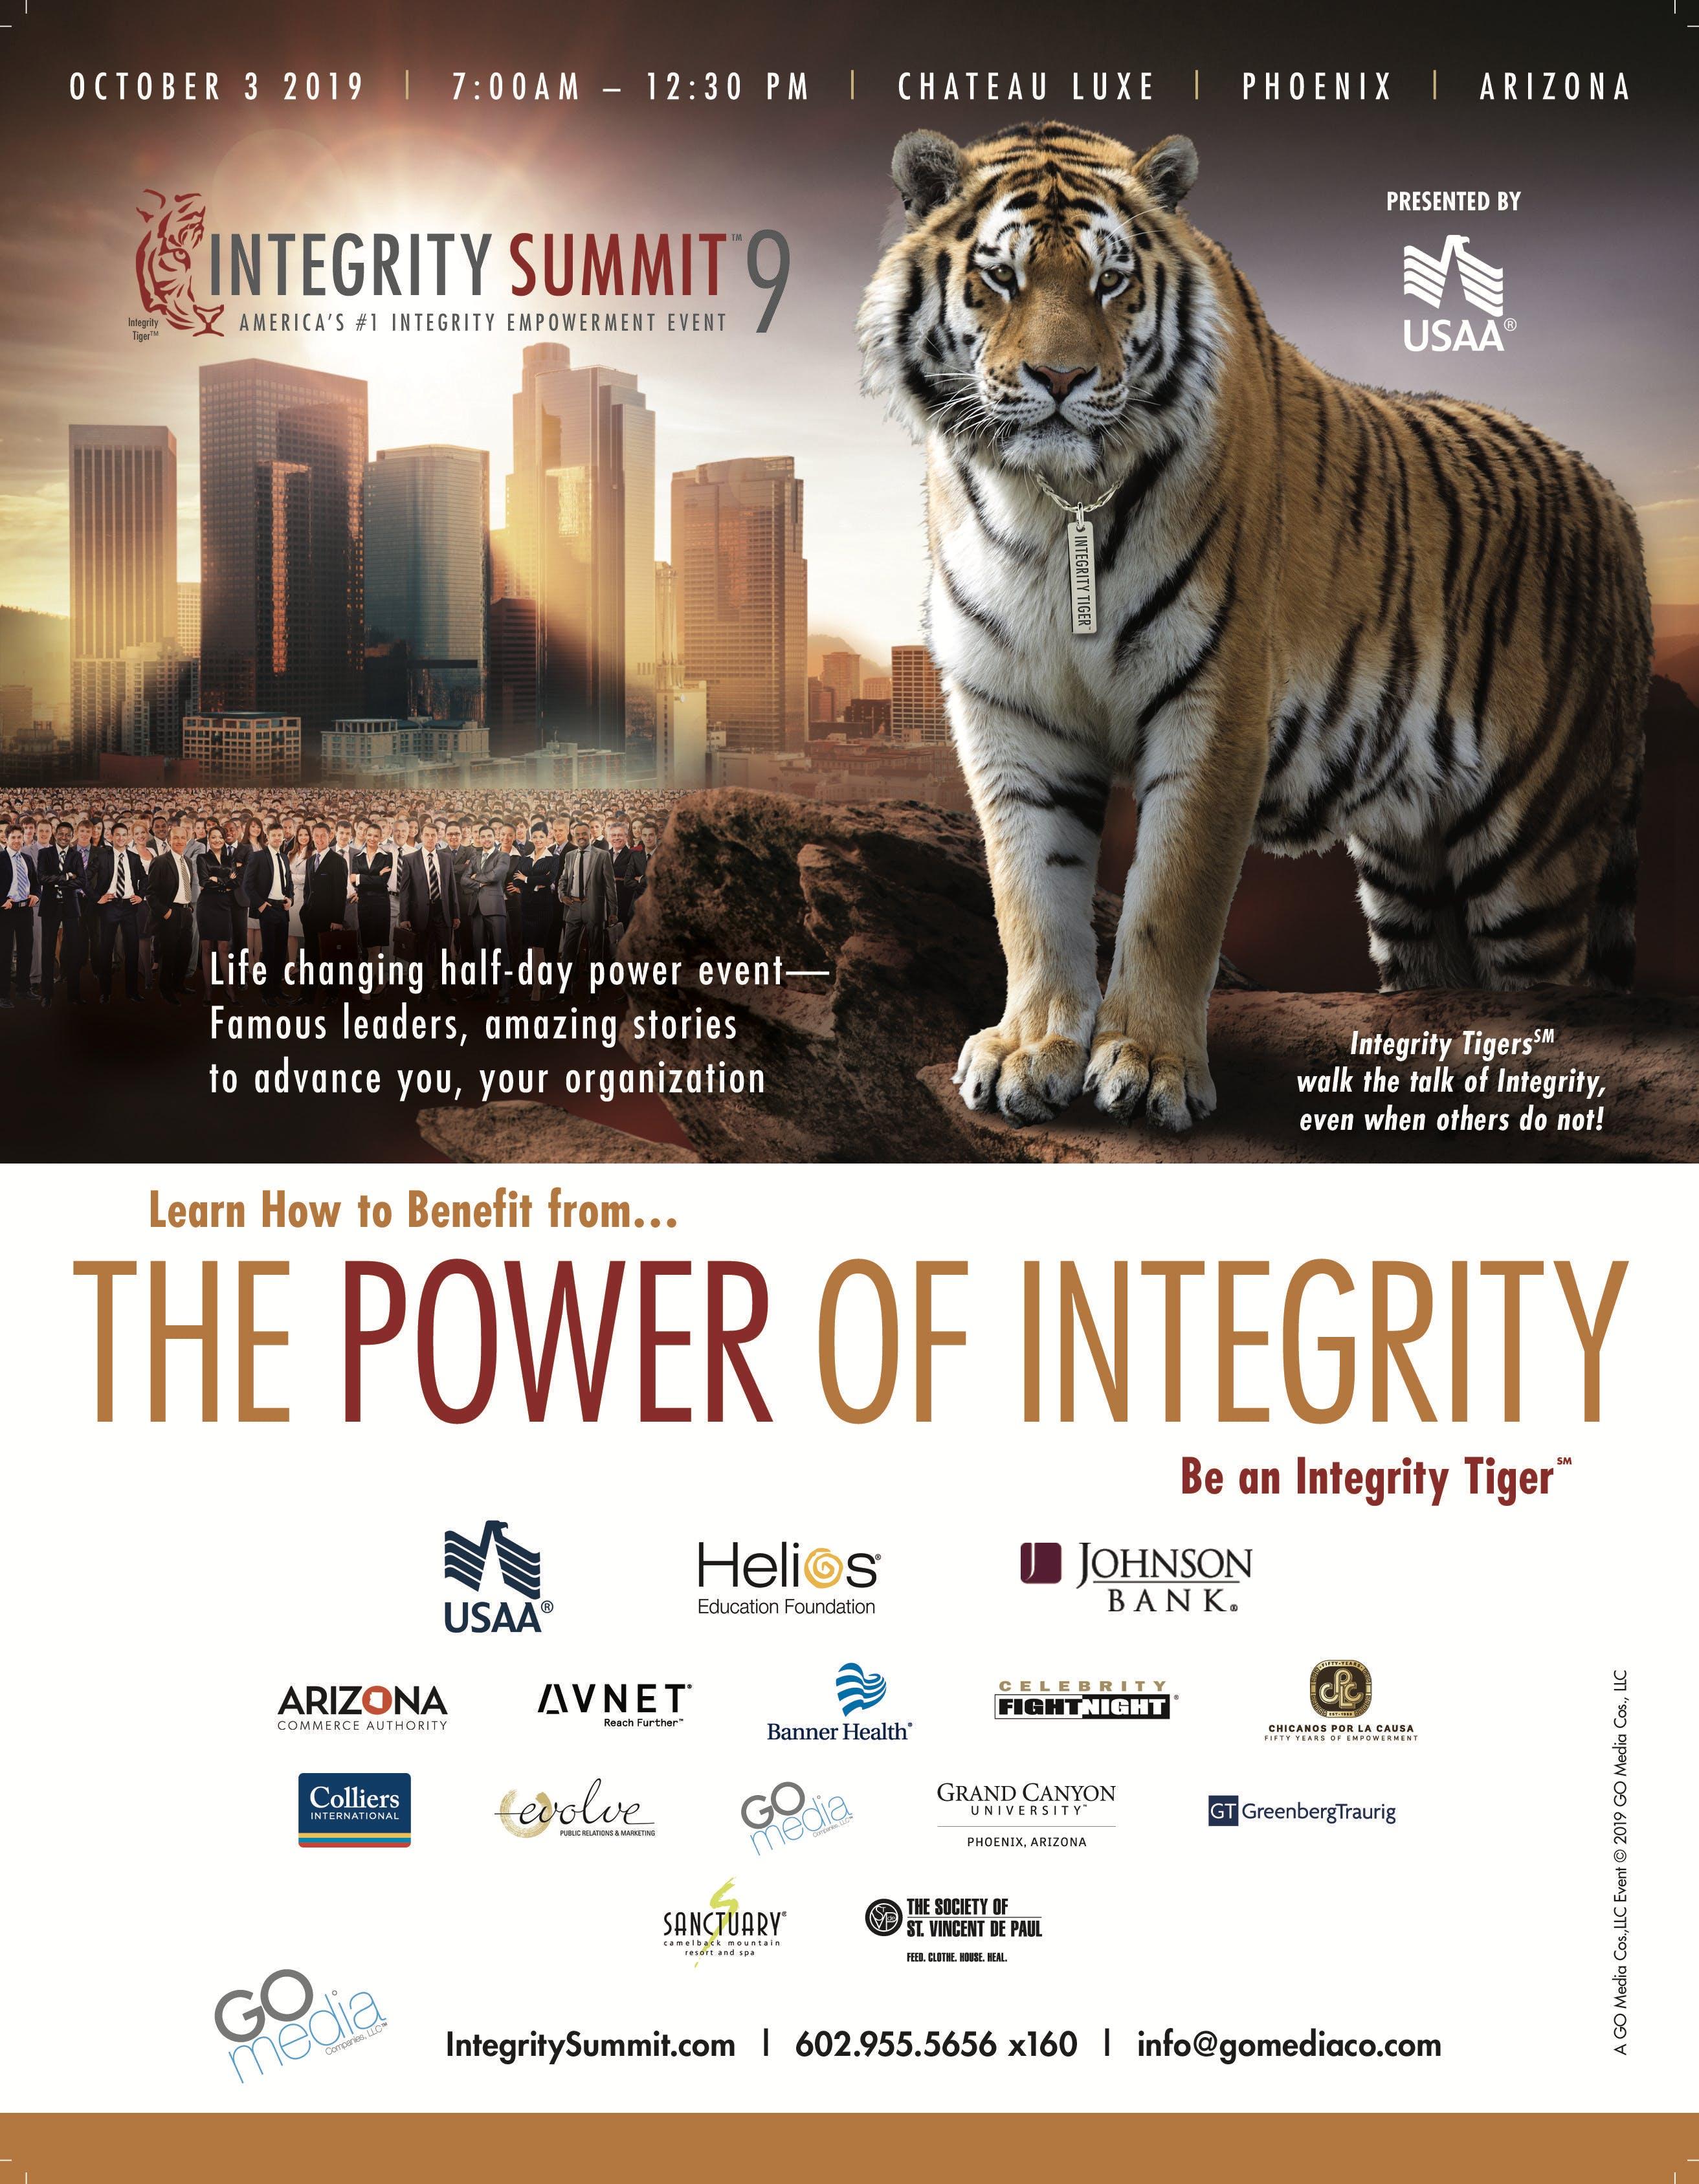 Integrity Summit